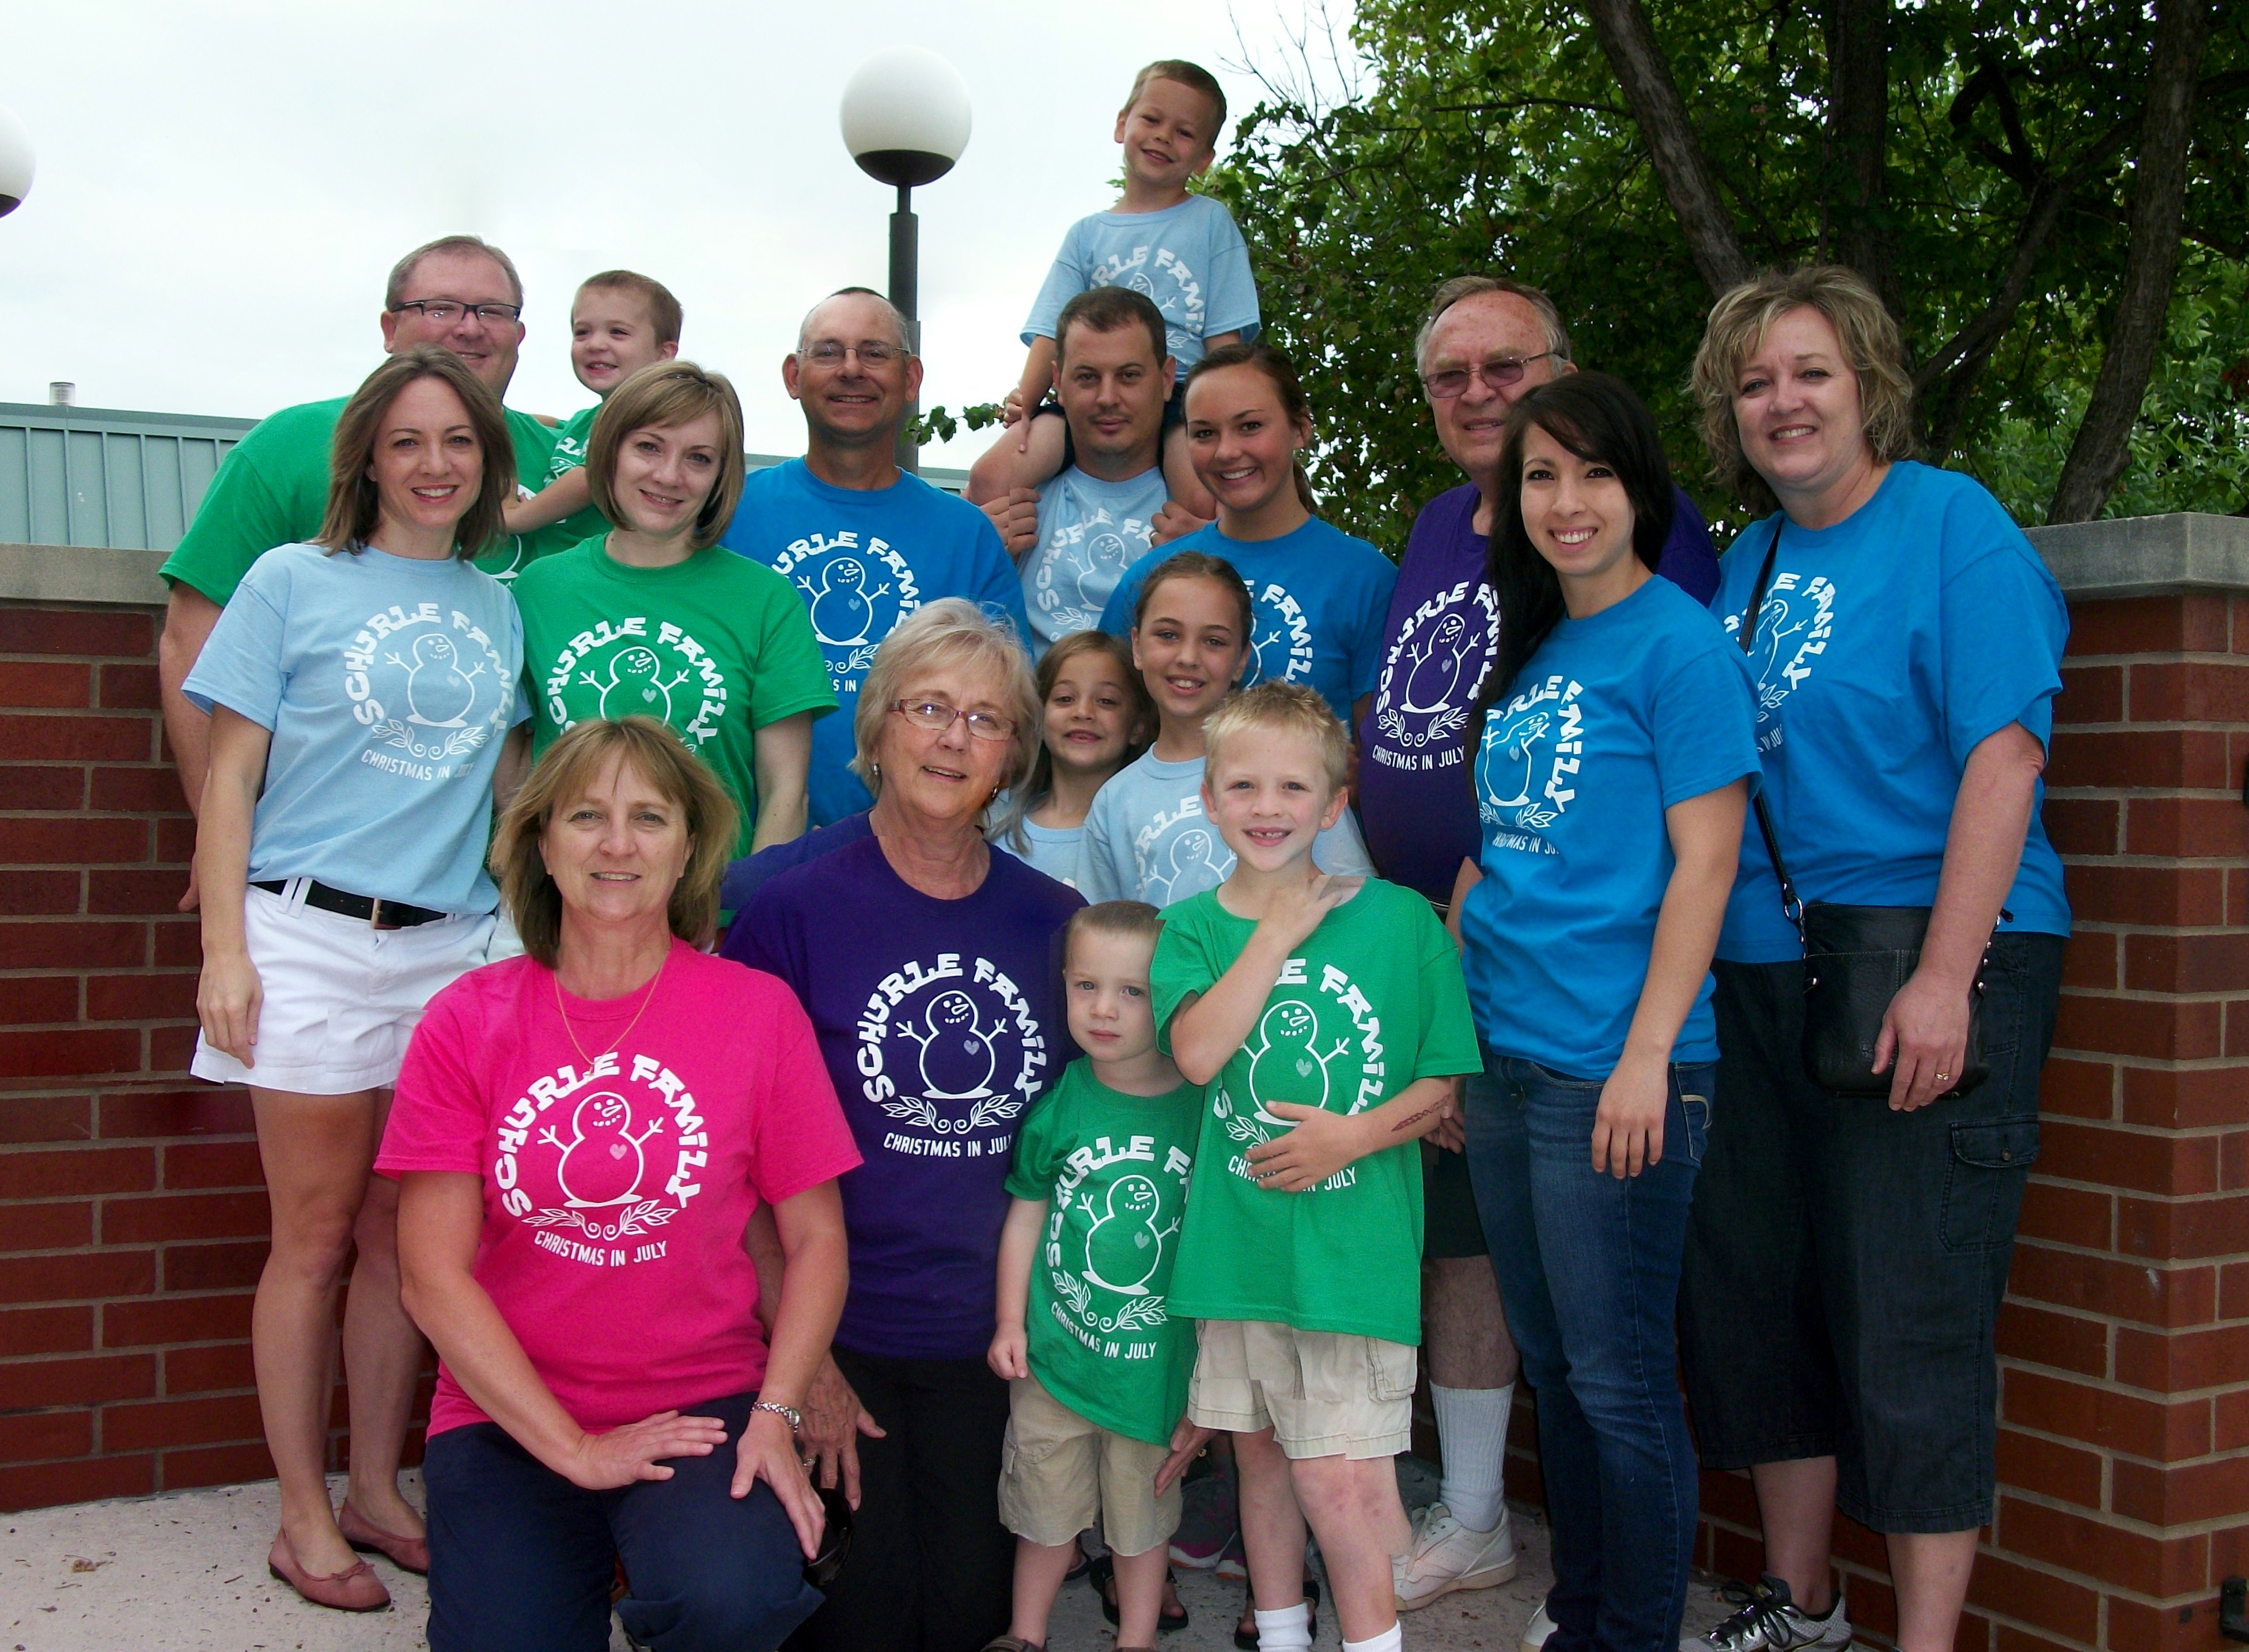 Custom T Shirts For St Louis Reunion Shirt Design Ideas